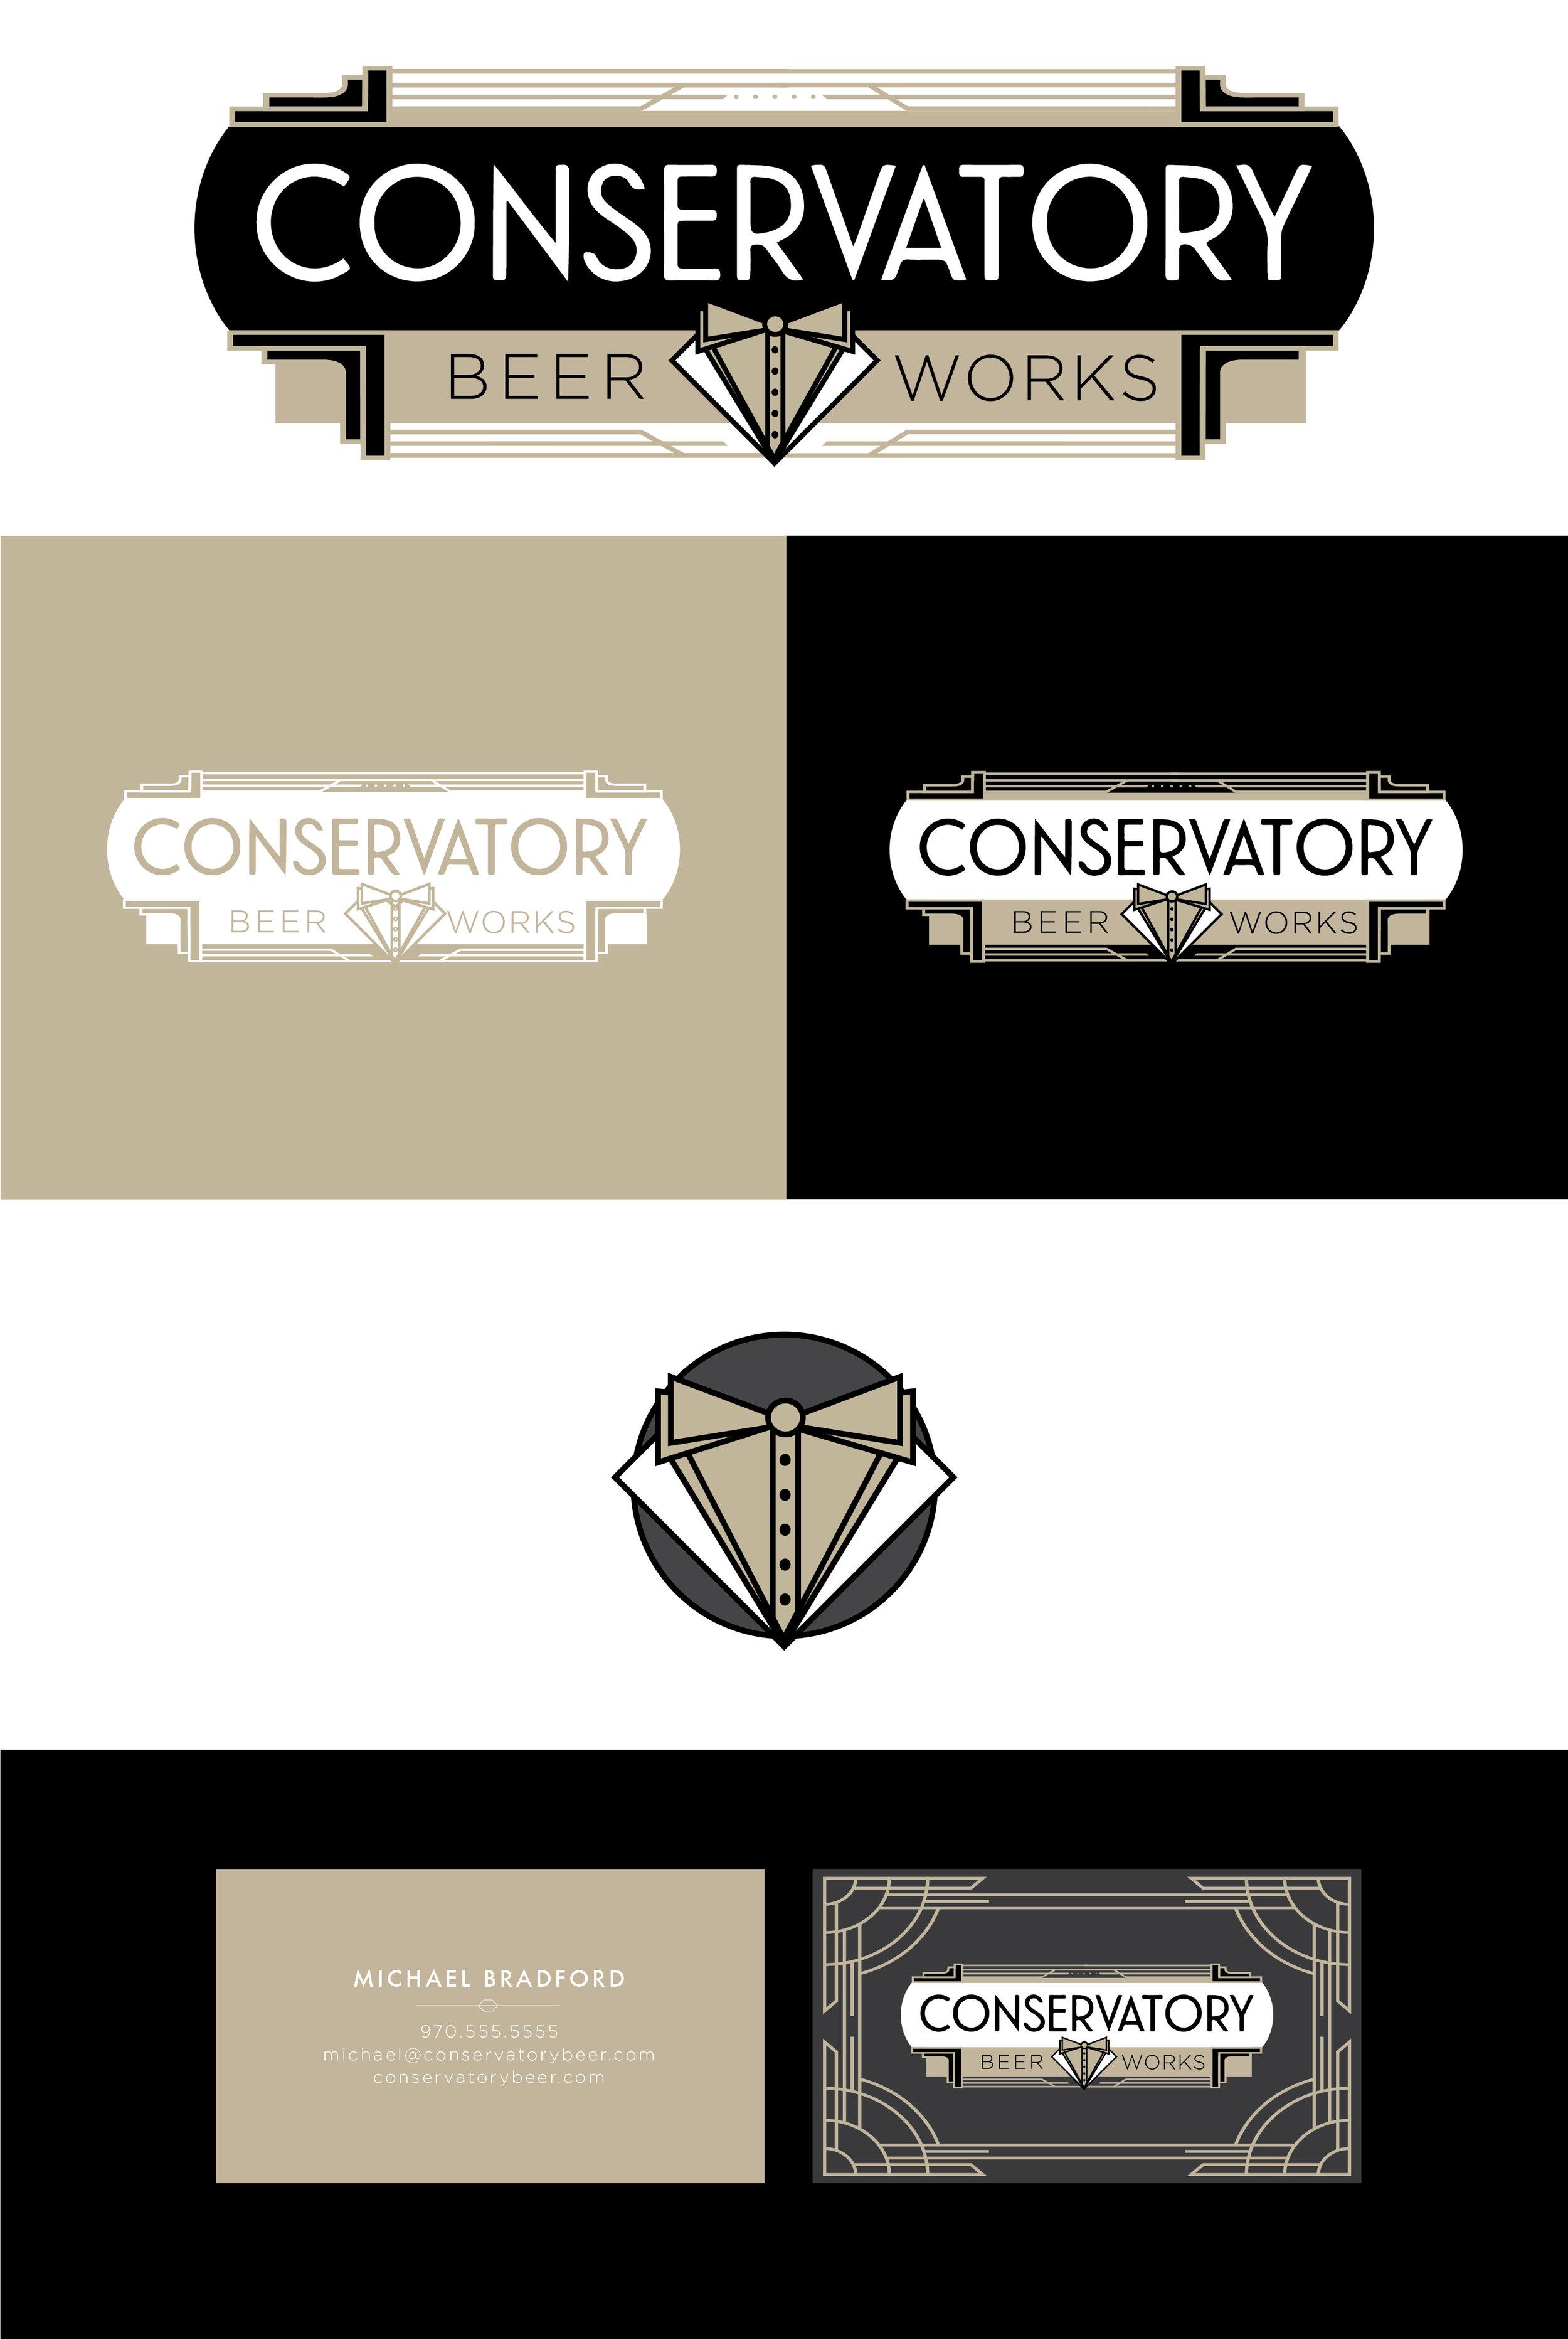 Conservatory_FirstLook-03.jpg